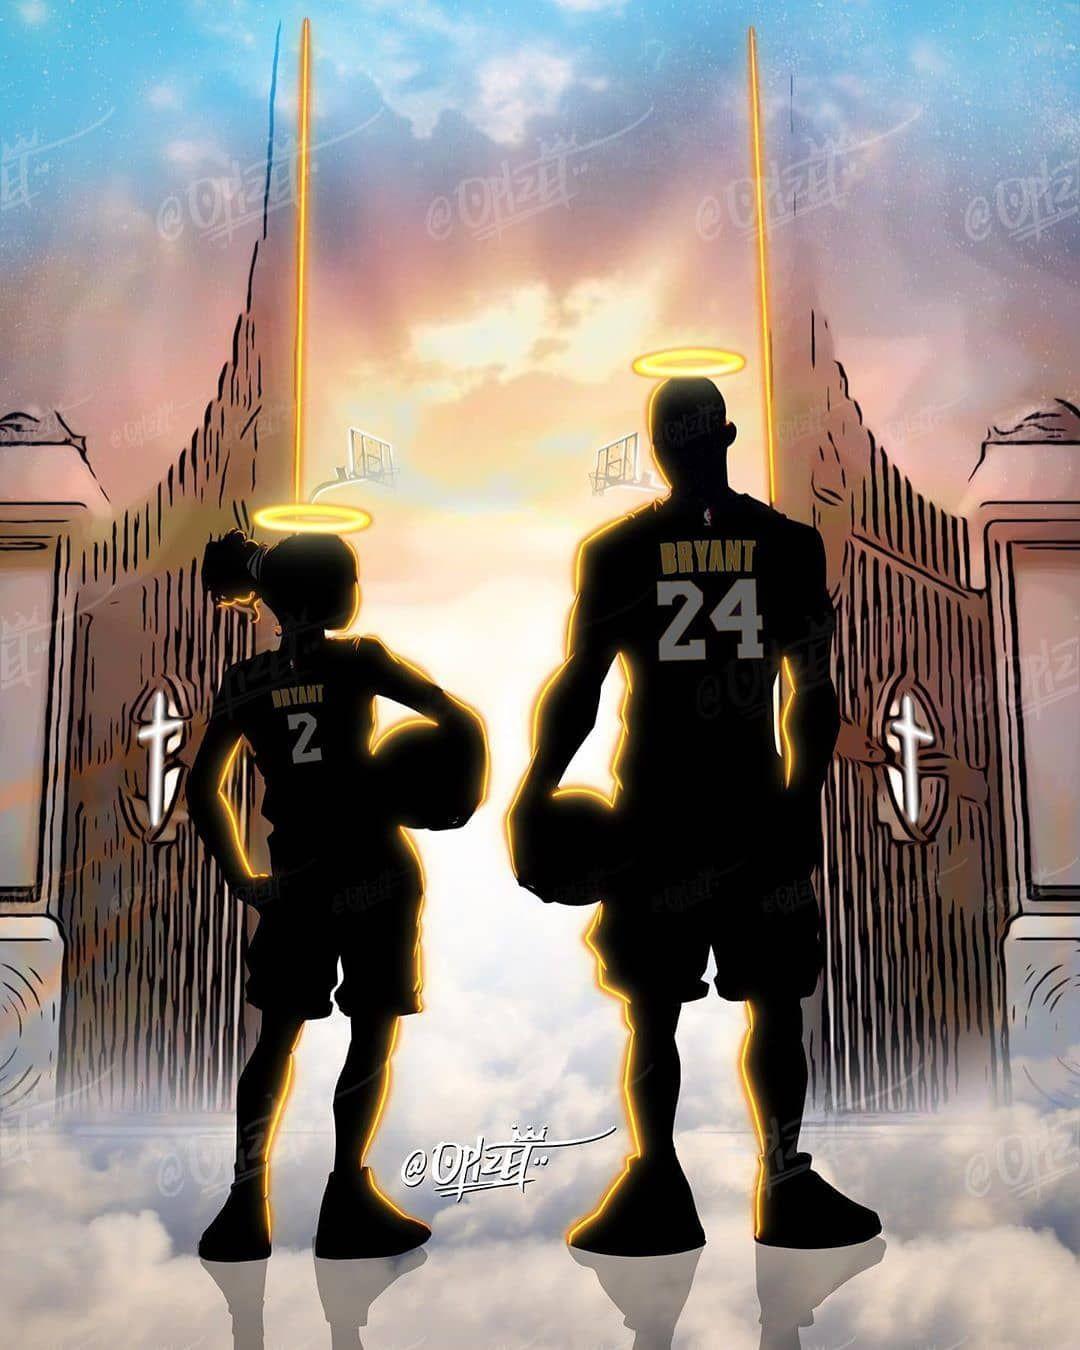 Kobe And Gigi Bryant Wallpaper In 2021 Kobe Bryant Pictures Kobe Bryant Wallpaper Kobe Bryant Poster